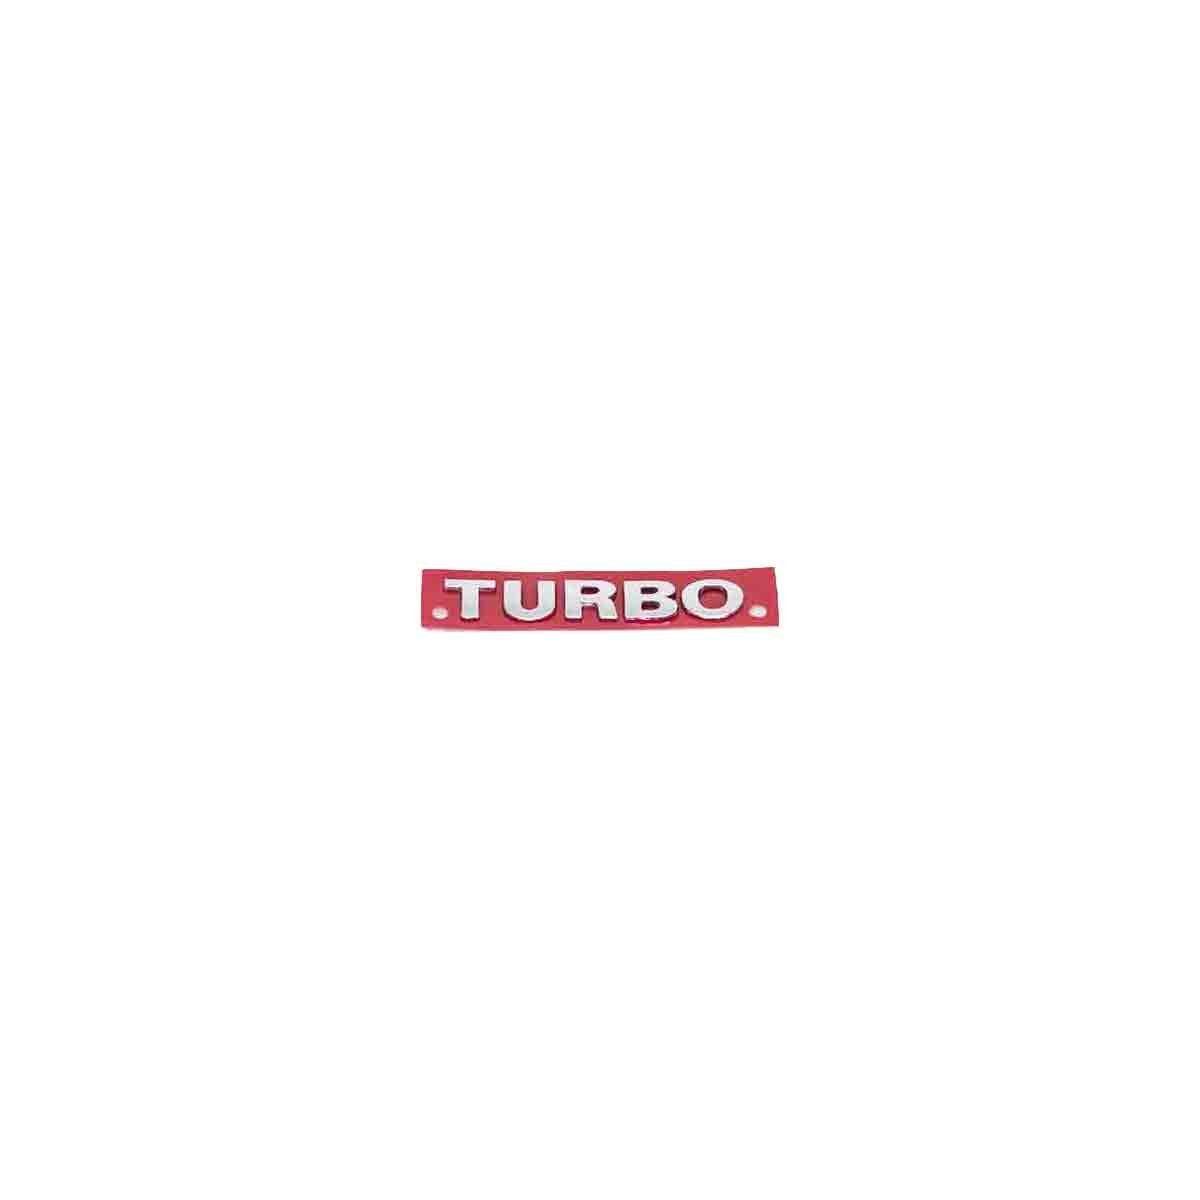 Emblema Turbo G3 Mini Cromado